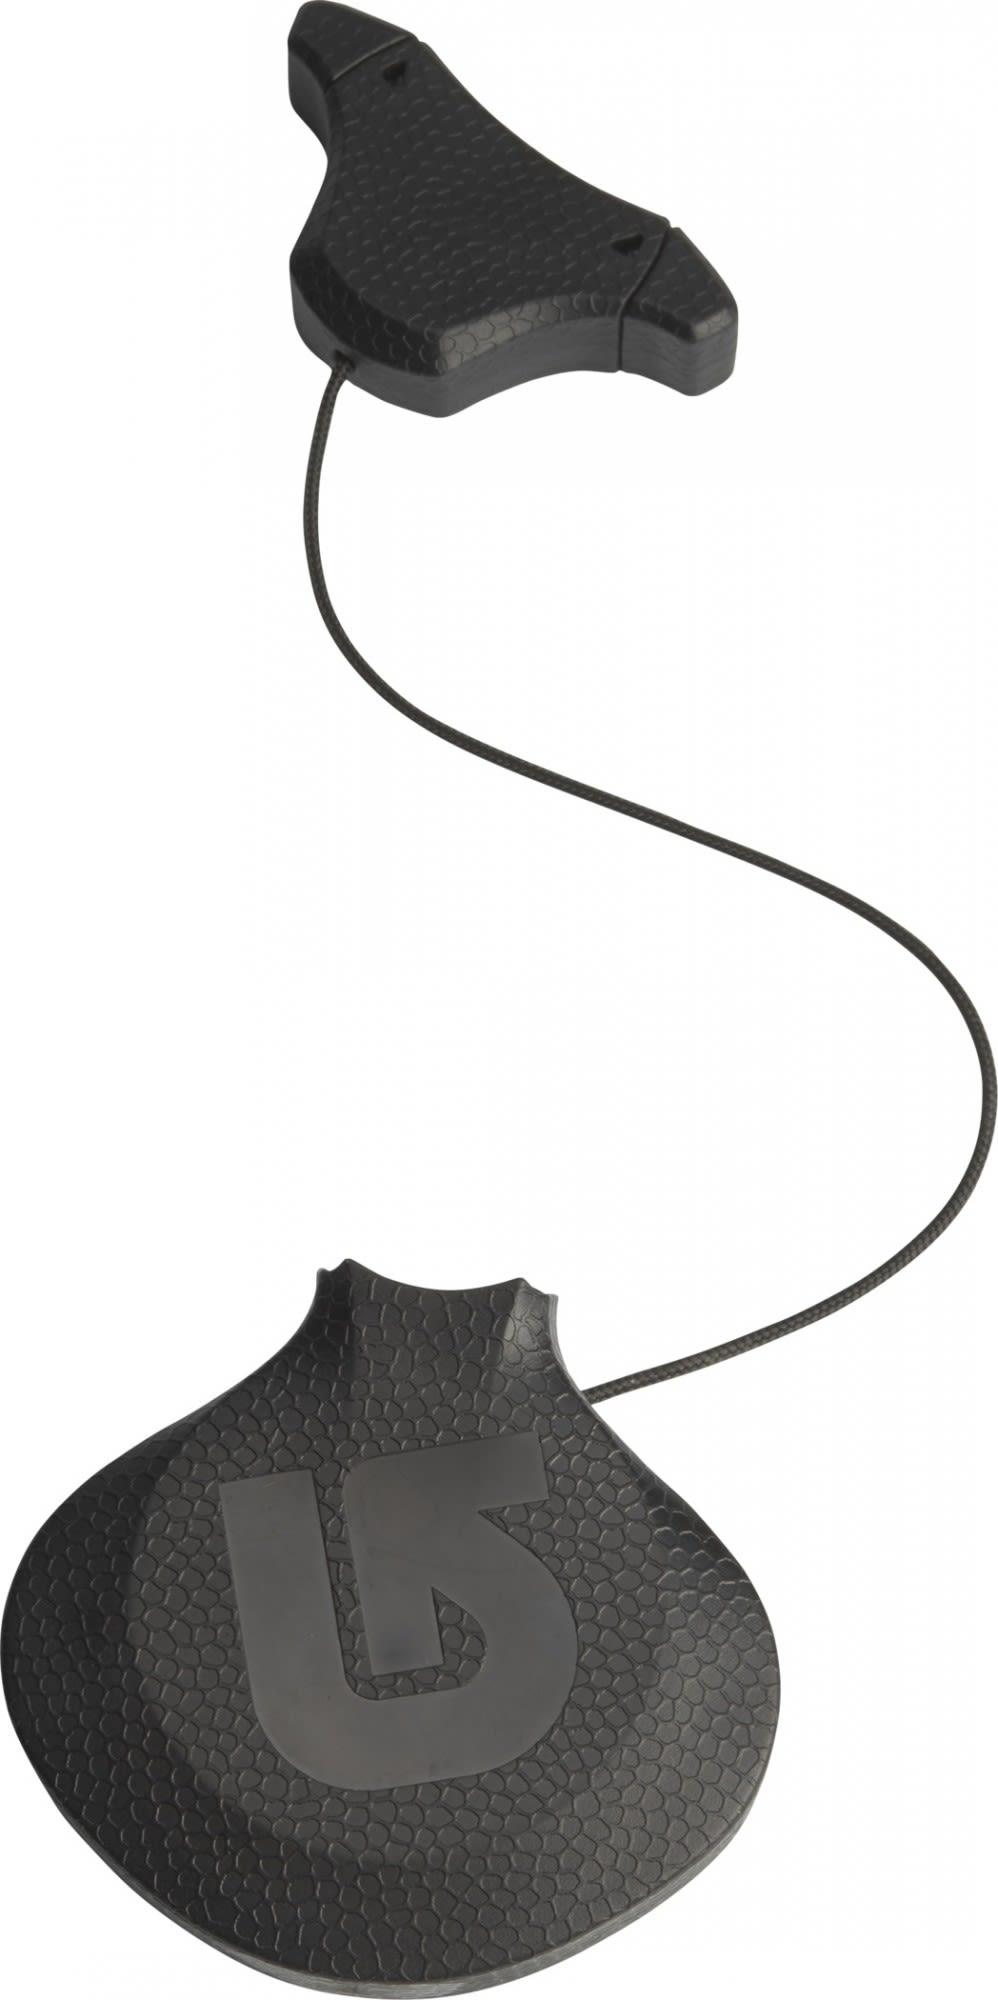 Burton Riglet Board Reel Schwarz, One Size -Farbe Black, One Size